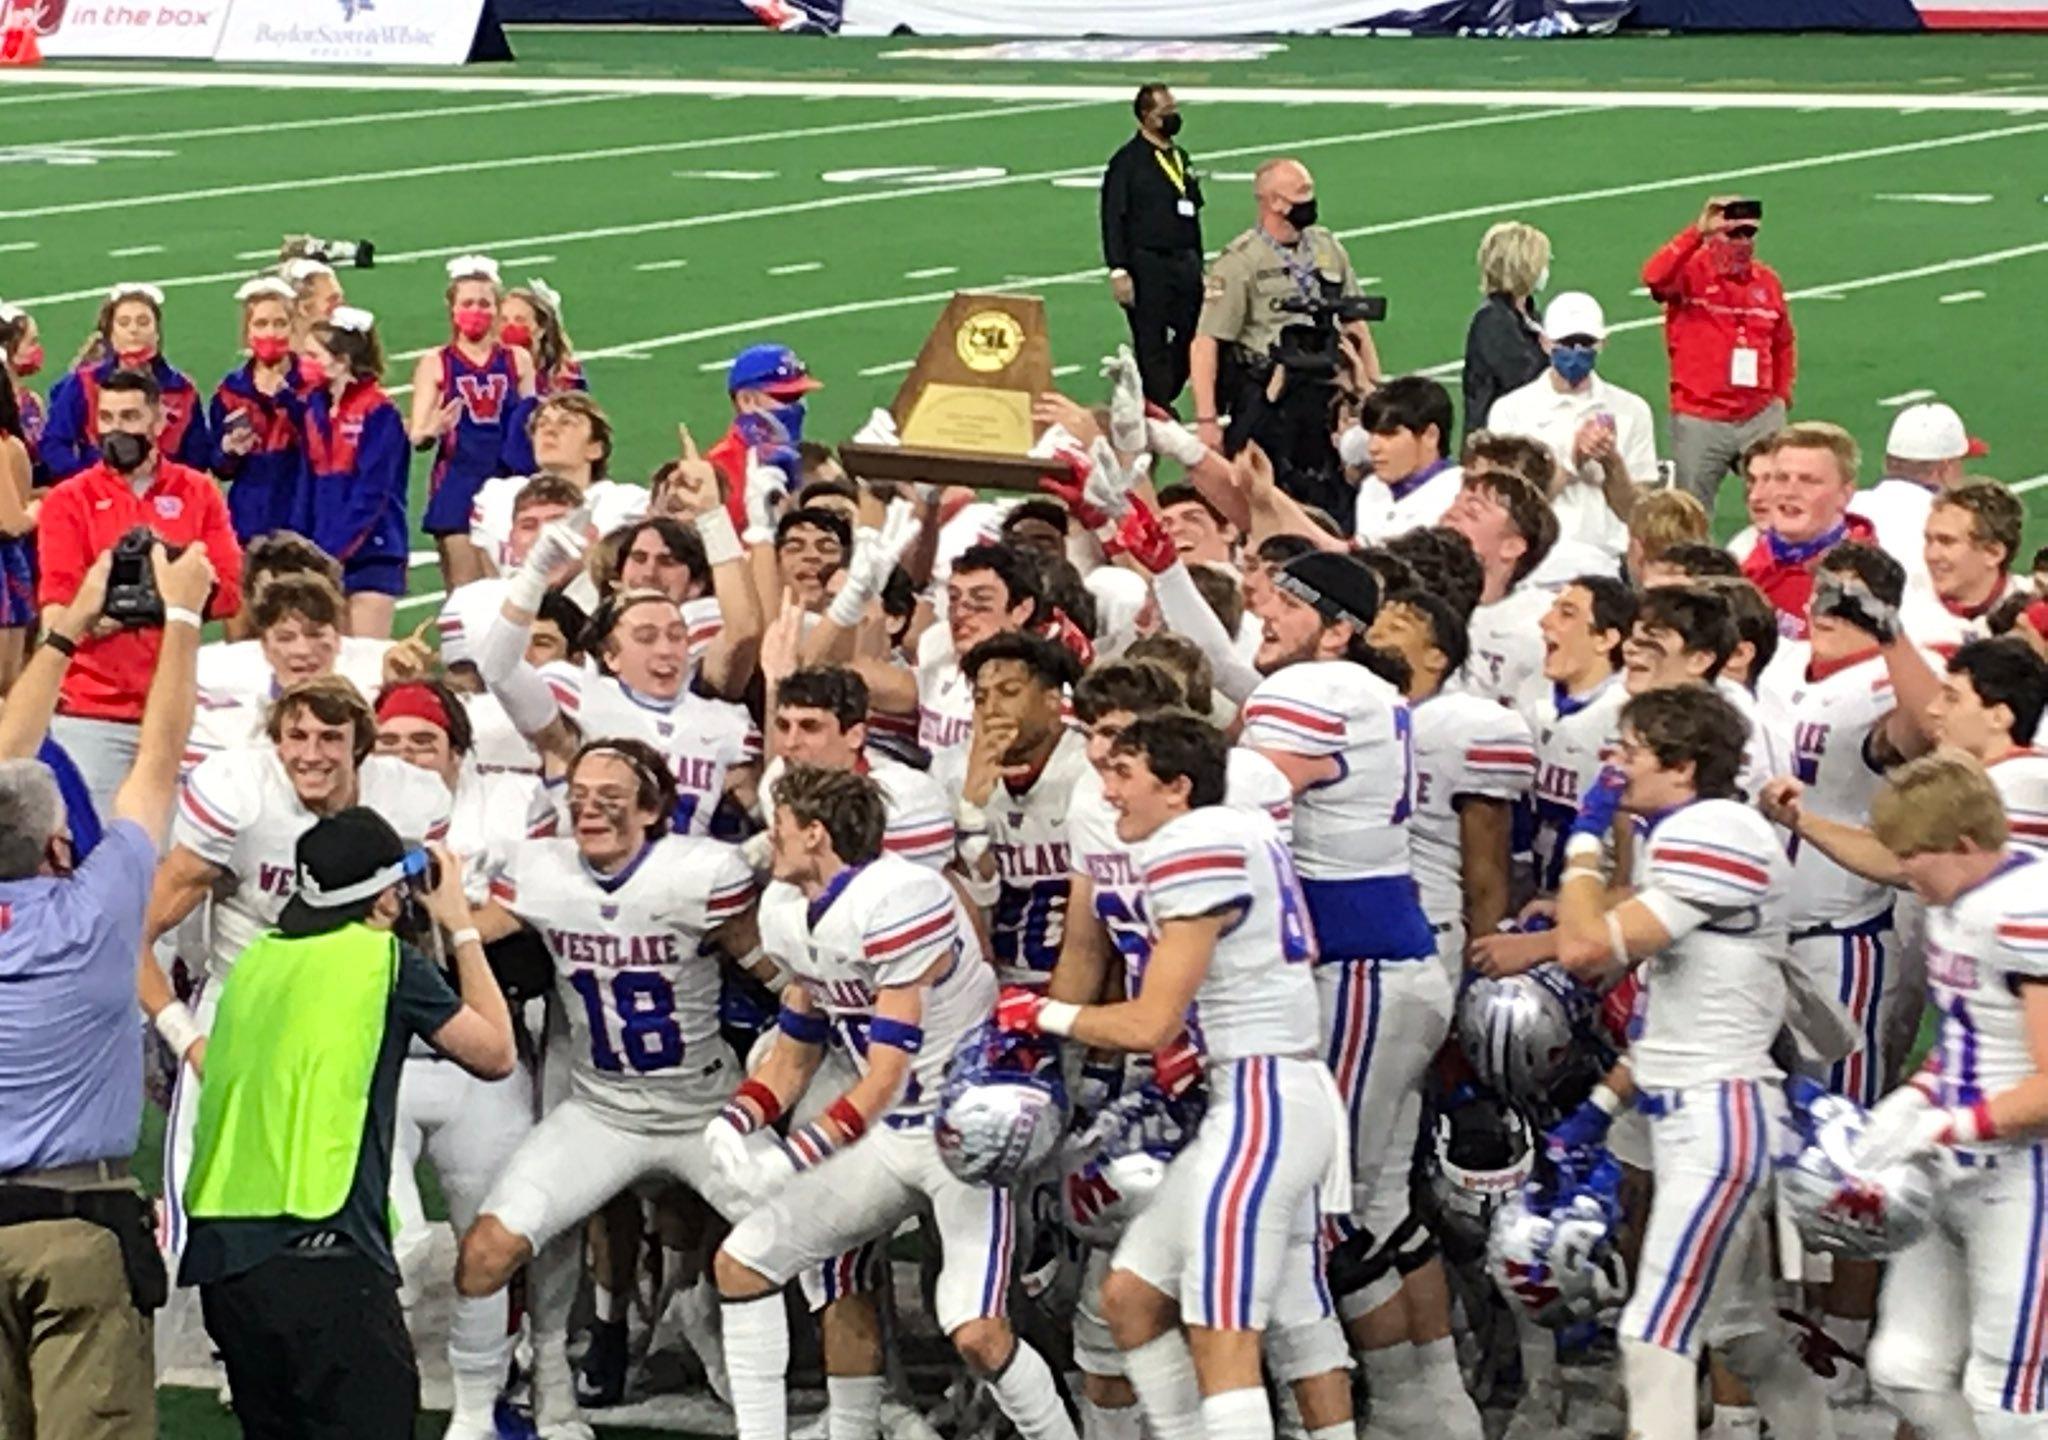 Westlake football wins 2020 state championship